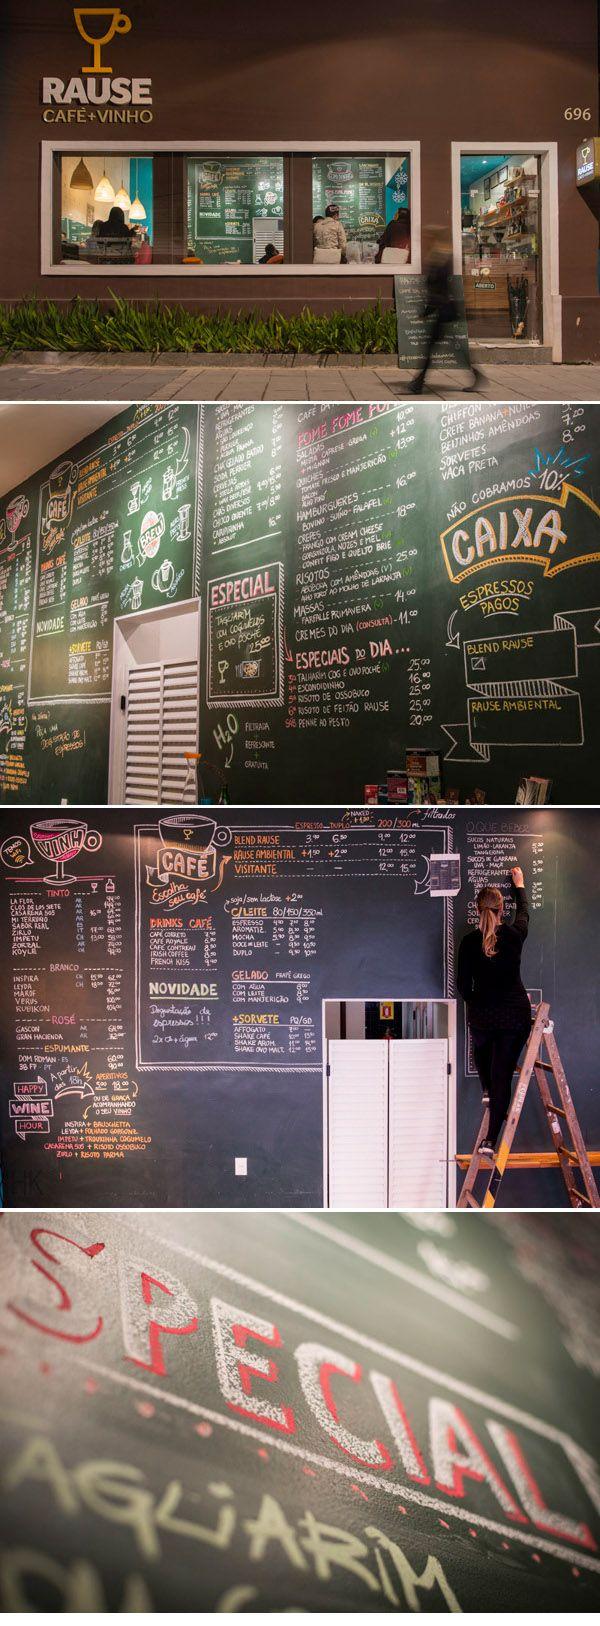 Chalkboard menu wall at Rause Café + Vinho. Curitiba, Brazil ( https://www.behance.net/gallery/9767049/Rause-Caf-Vinho )